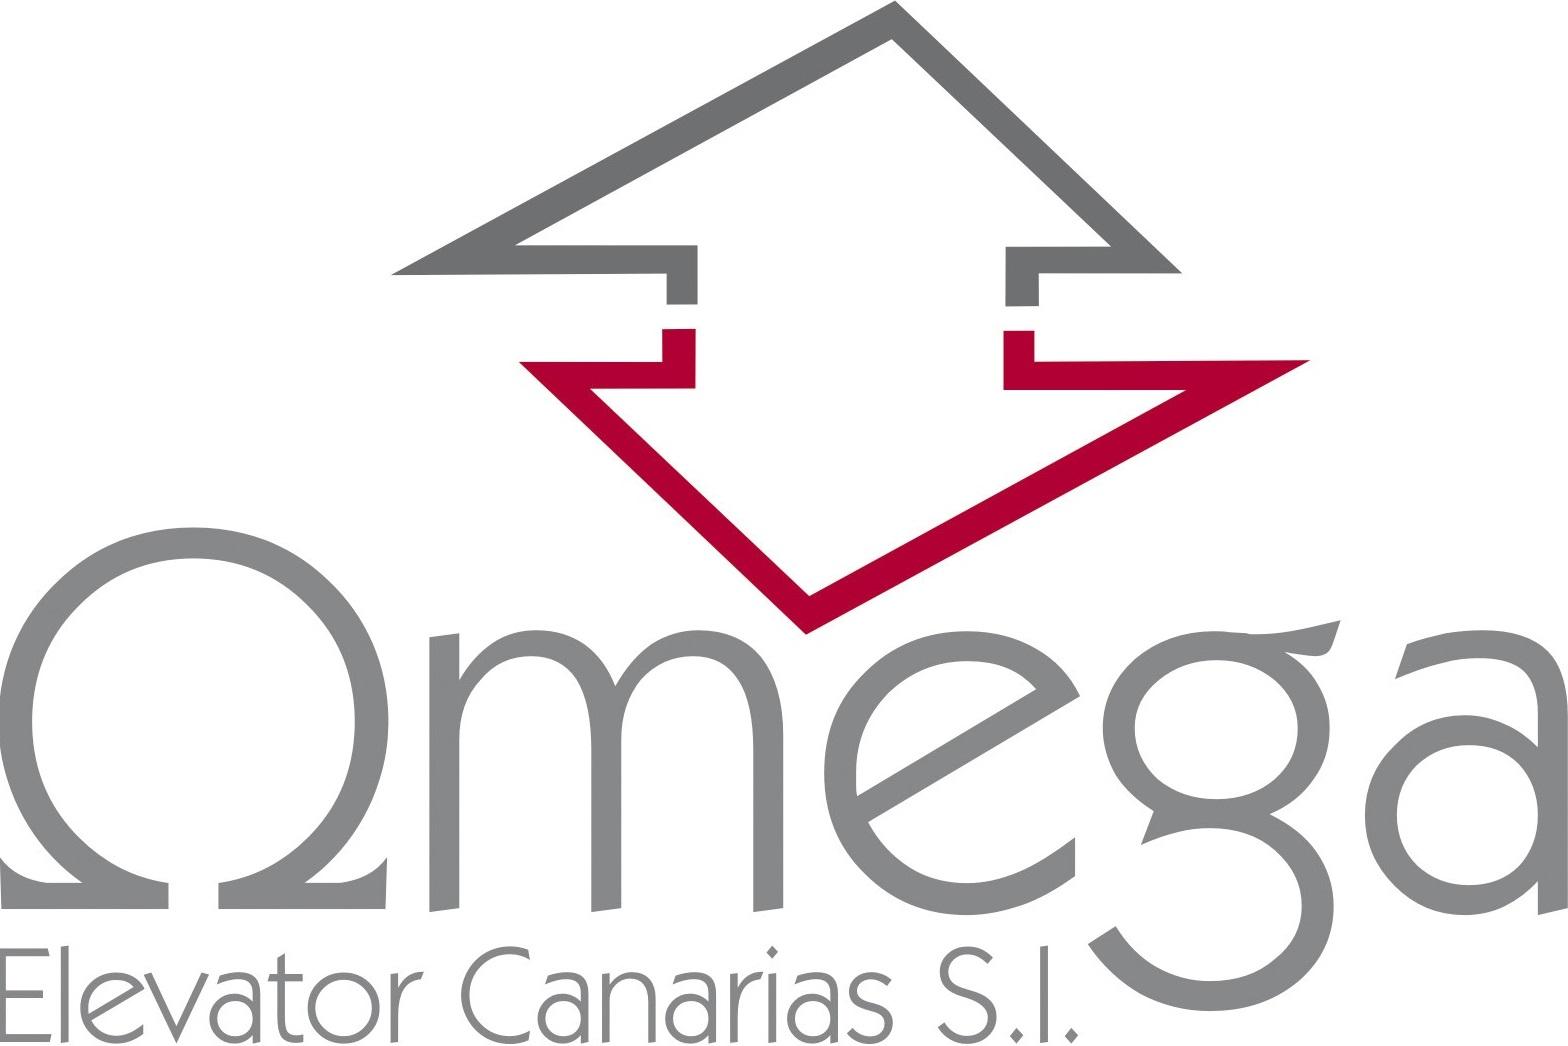 Omega Elevator Canarias S.l